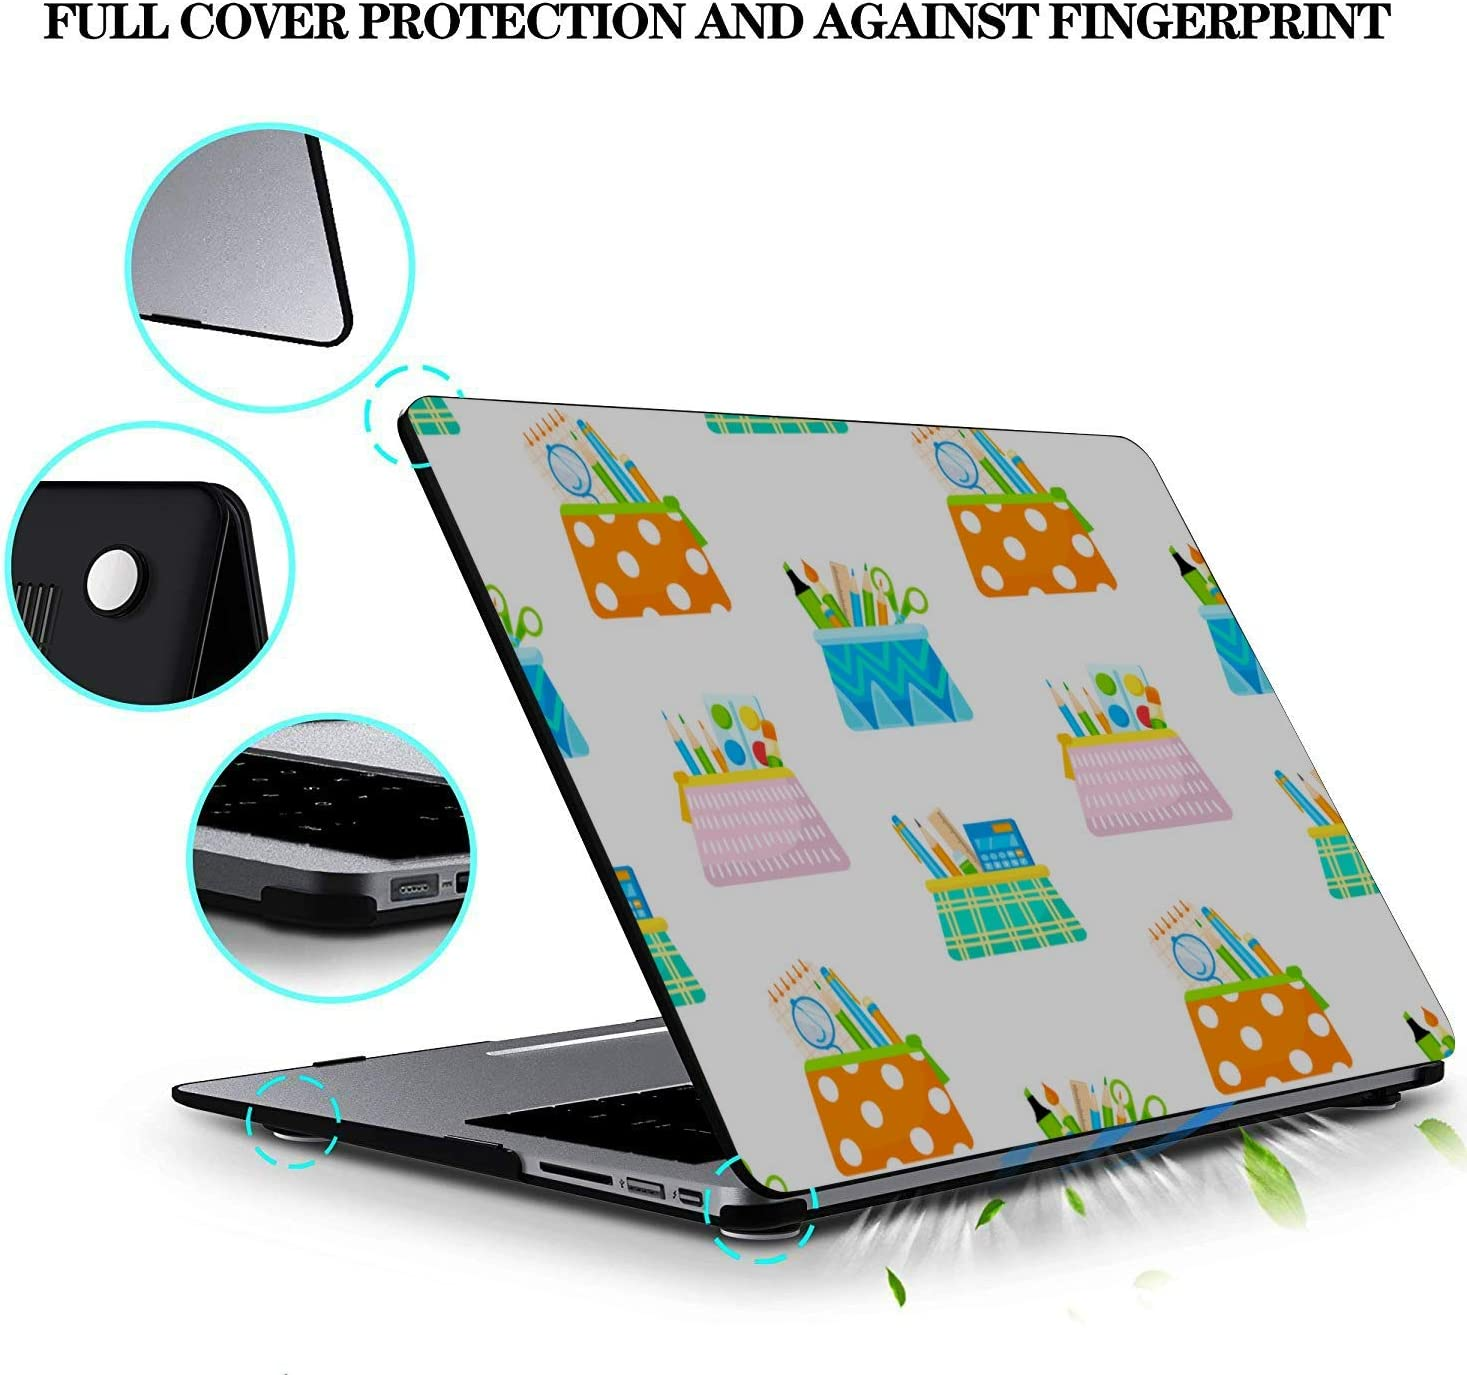 MacBook 2018 Case School Supplies Pencil Sharpener Plastic Hard Shell Compatible Mac Air 11 Pro 13 15 MacBook Protector Protection for MacBook 2016-2019 Version